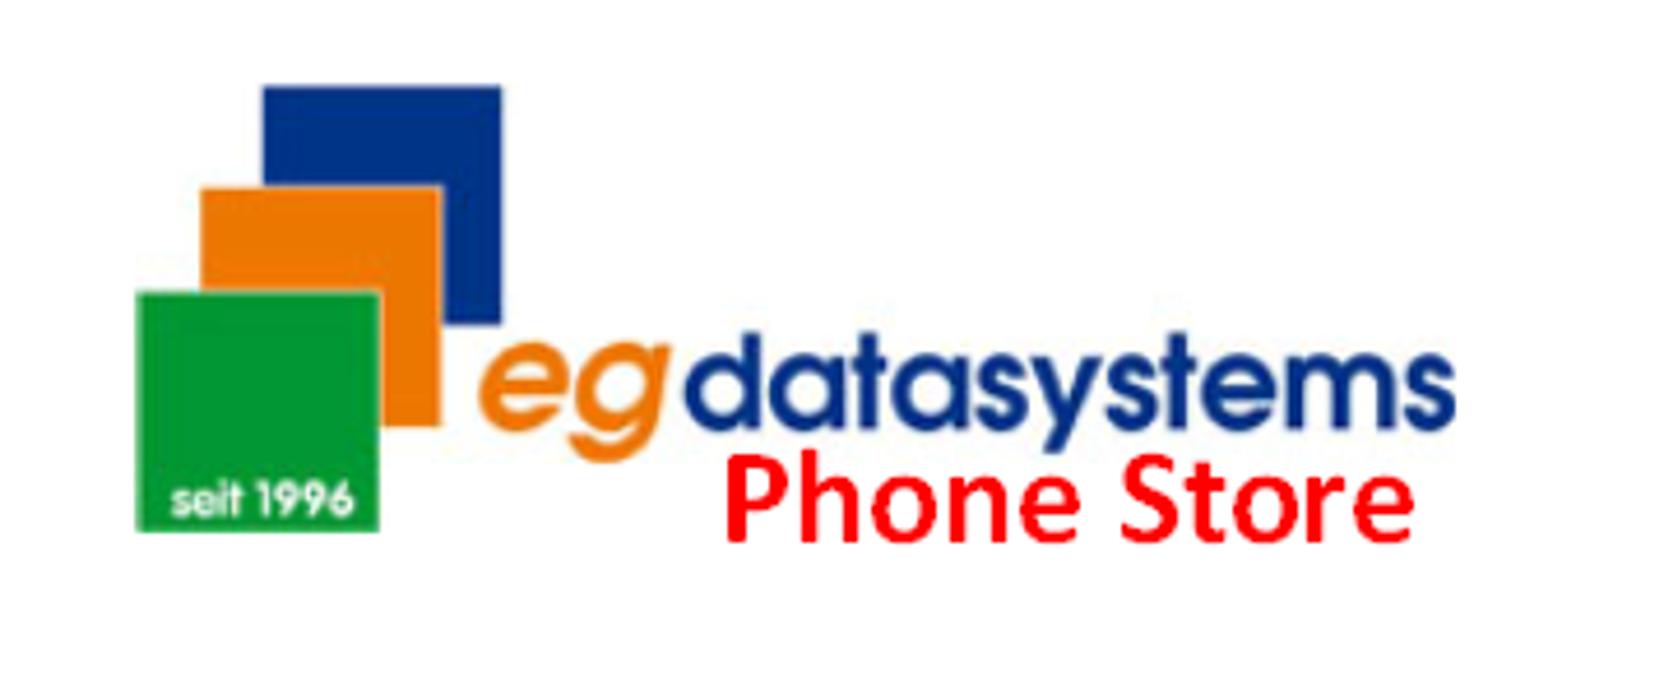 eg datasystems